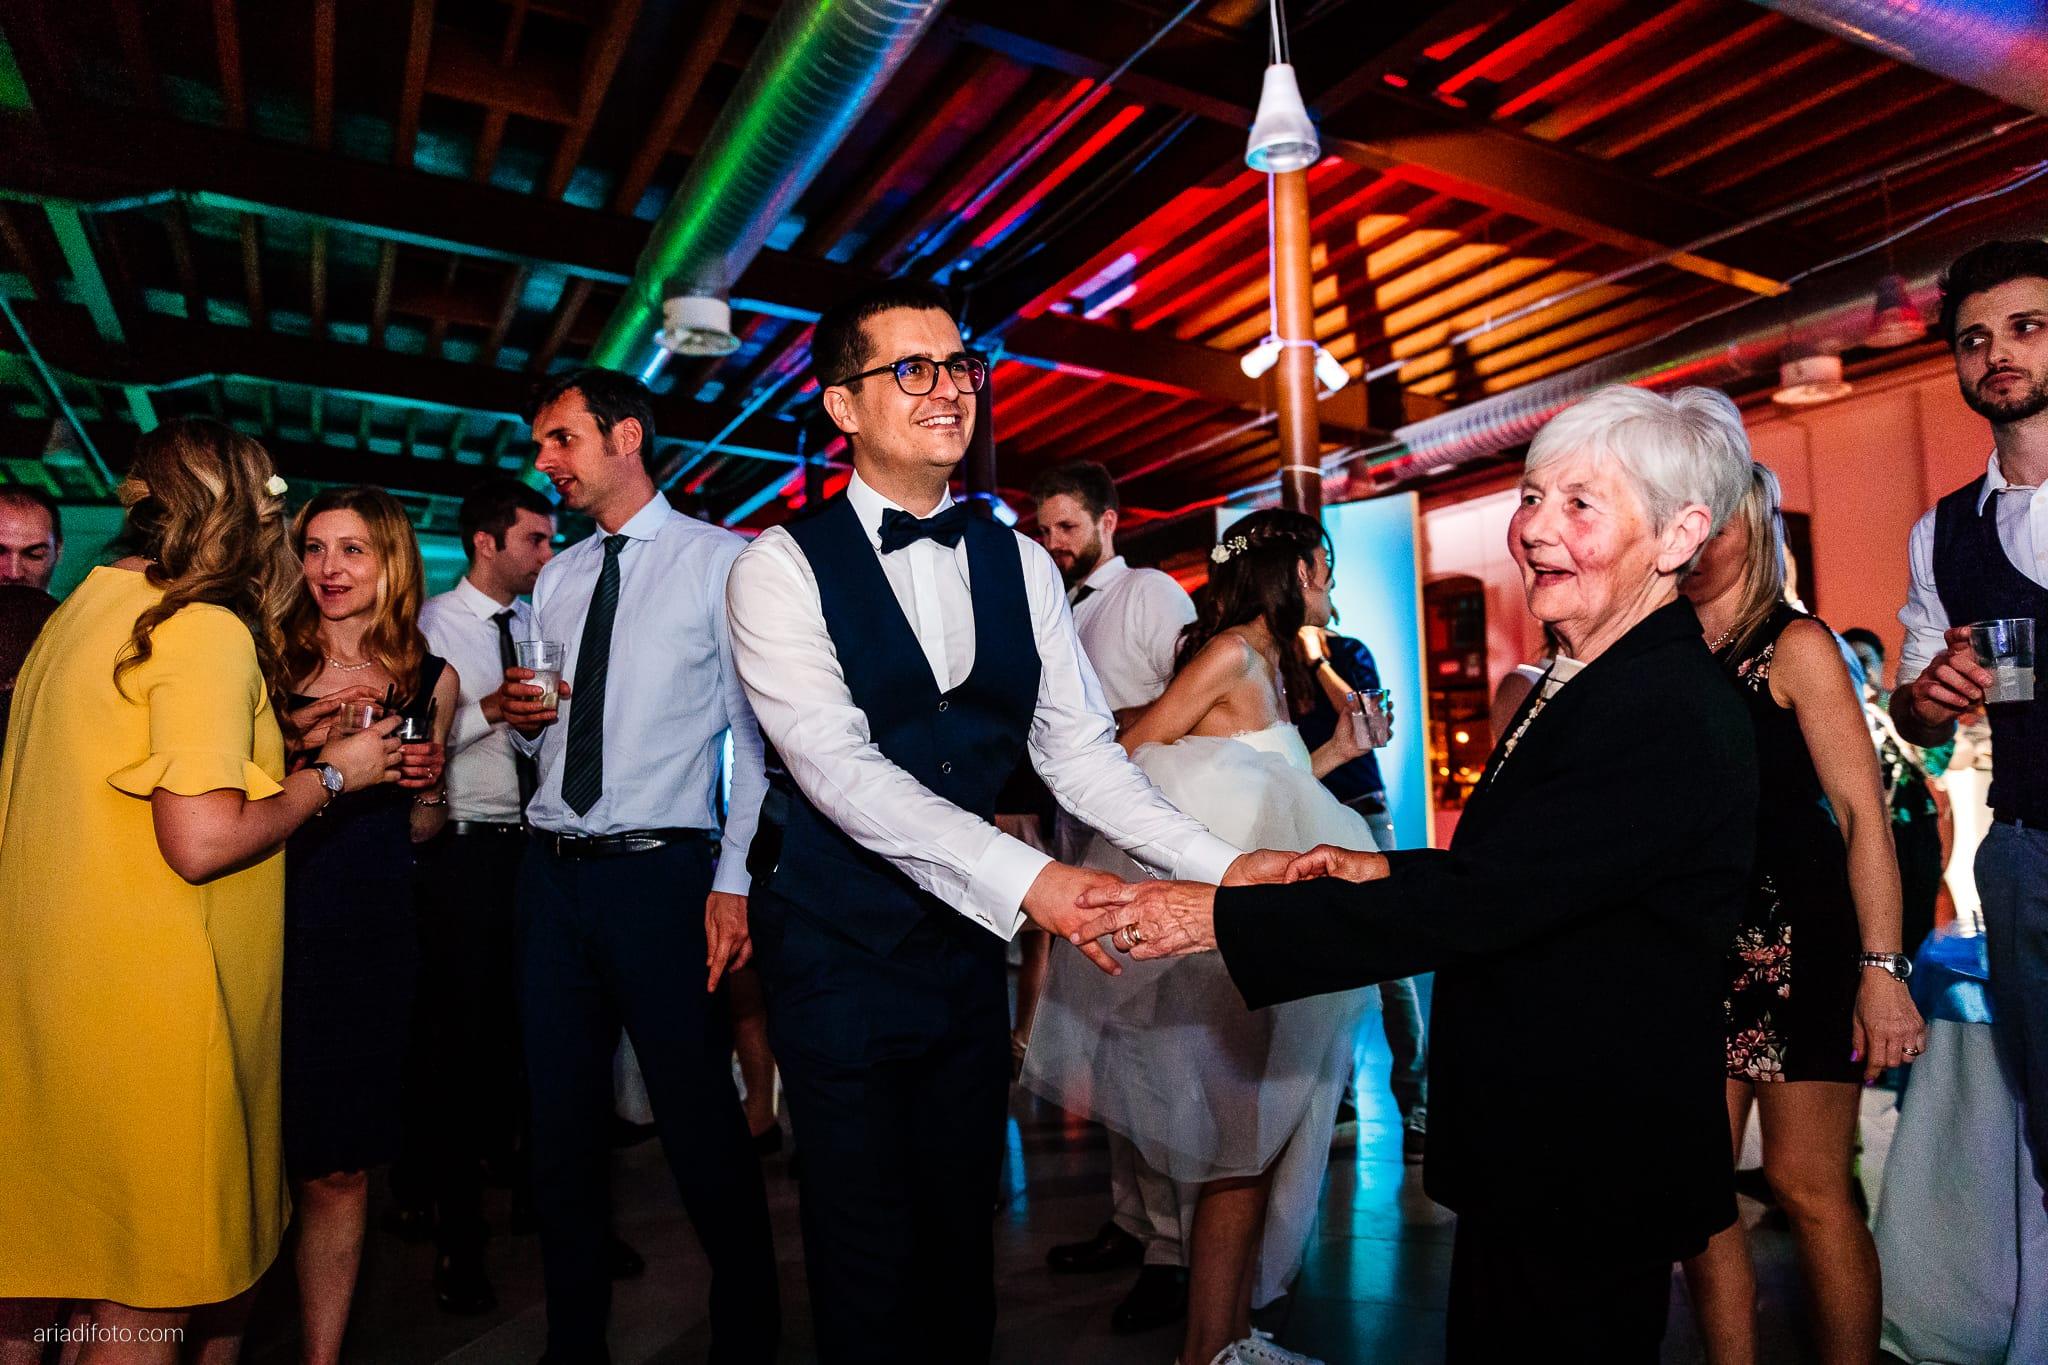 Marina Stefano Matrimonio Castello San Giusto Molo IV Trieste ricevimento balli festa